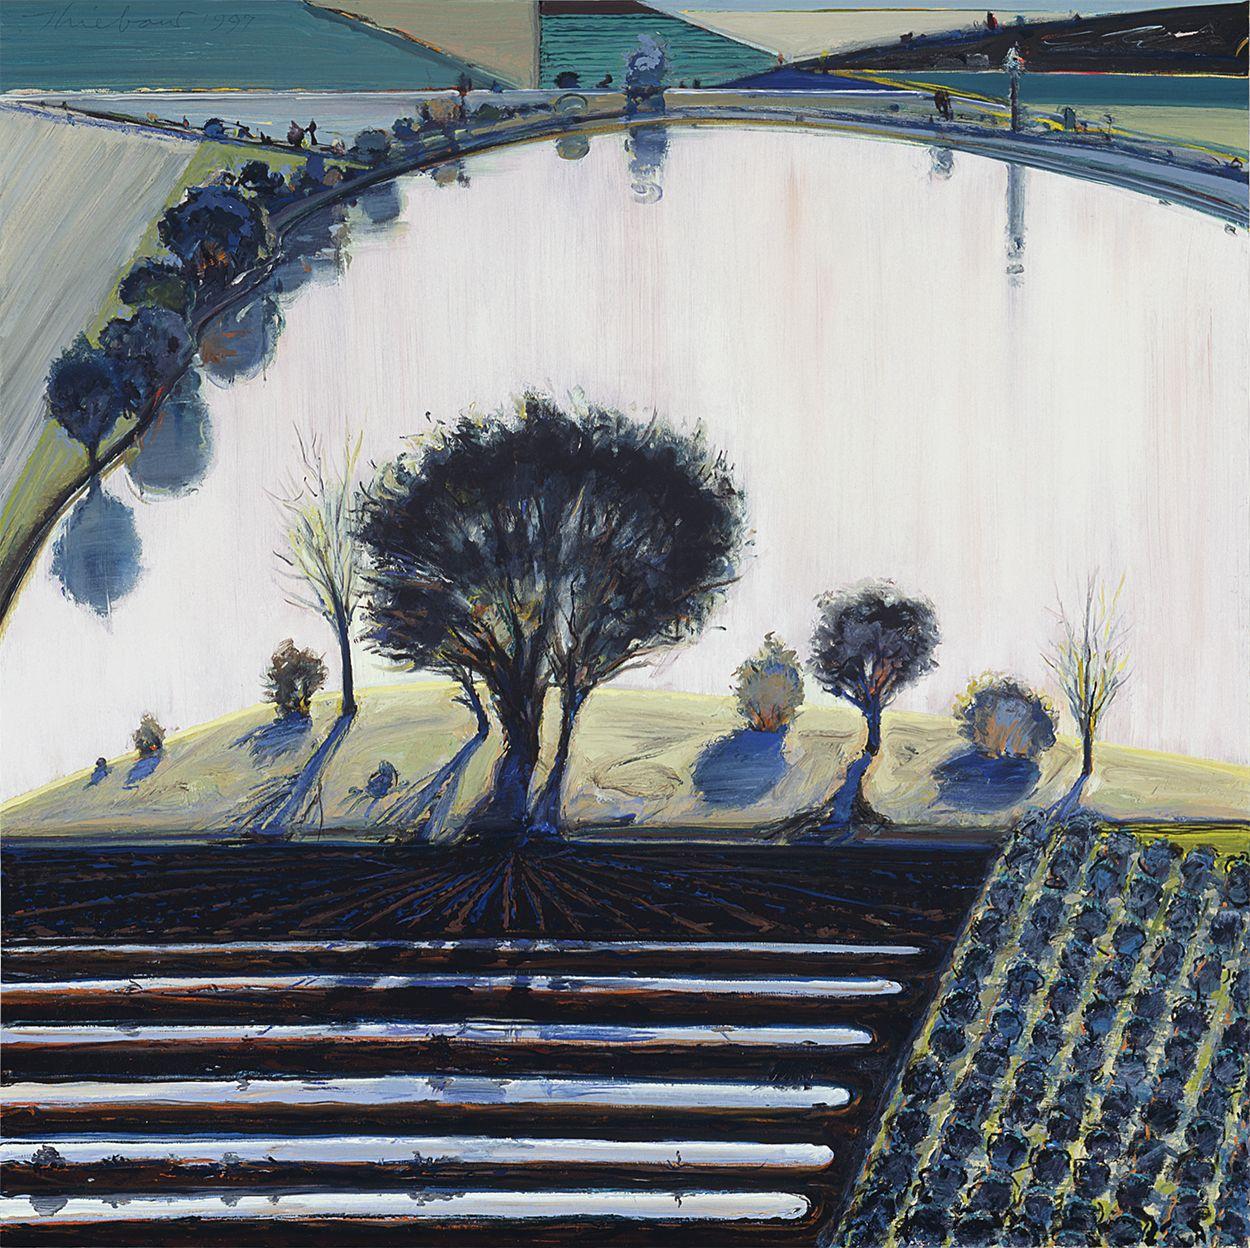 Wayne Thiebaud, River Pool,1997, oil on canvas, 36 x 35 3/4 inches (91.4 x 90.8 cm), Acquavella Galleries. Art ©Wayne Thiebaud / Licensed by VAGA, New York, NY